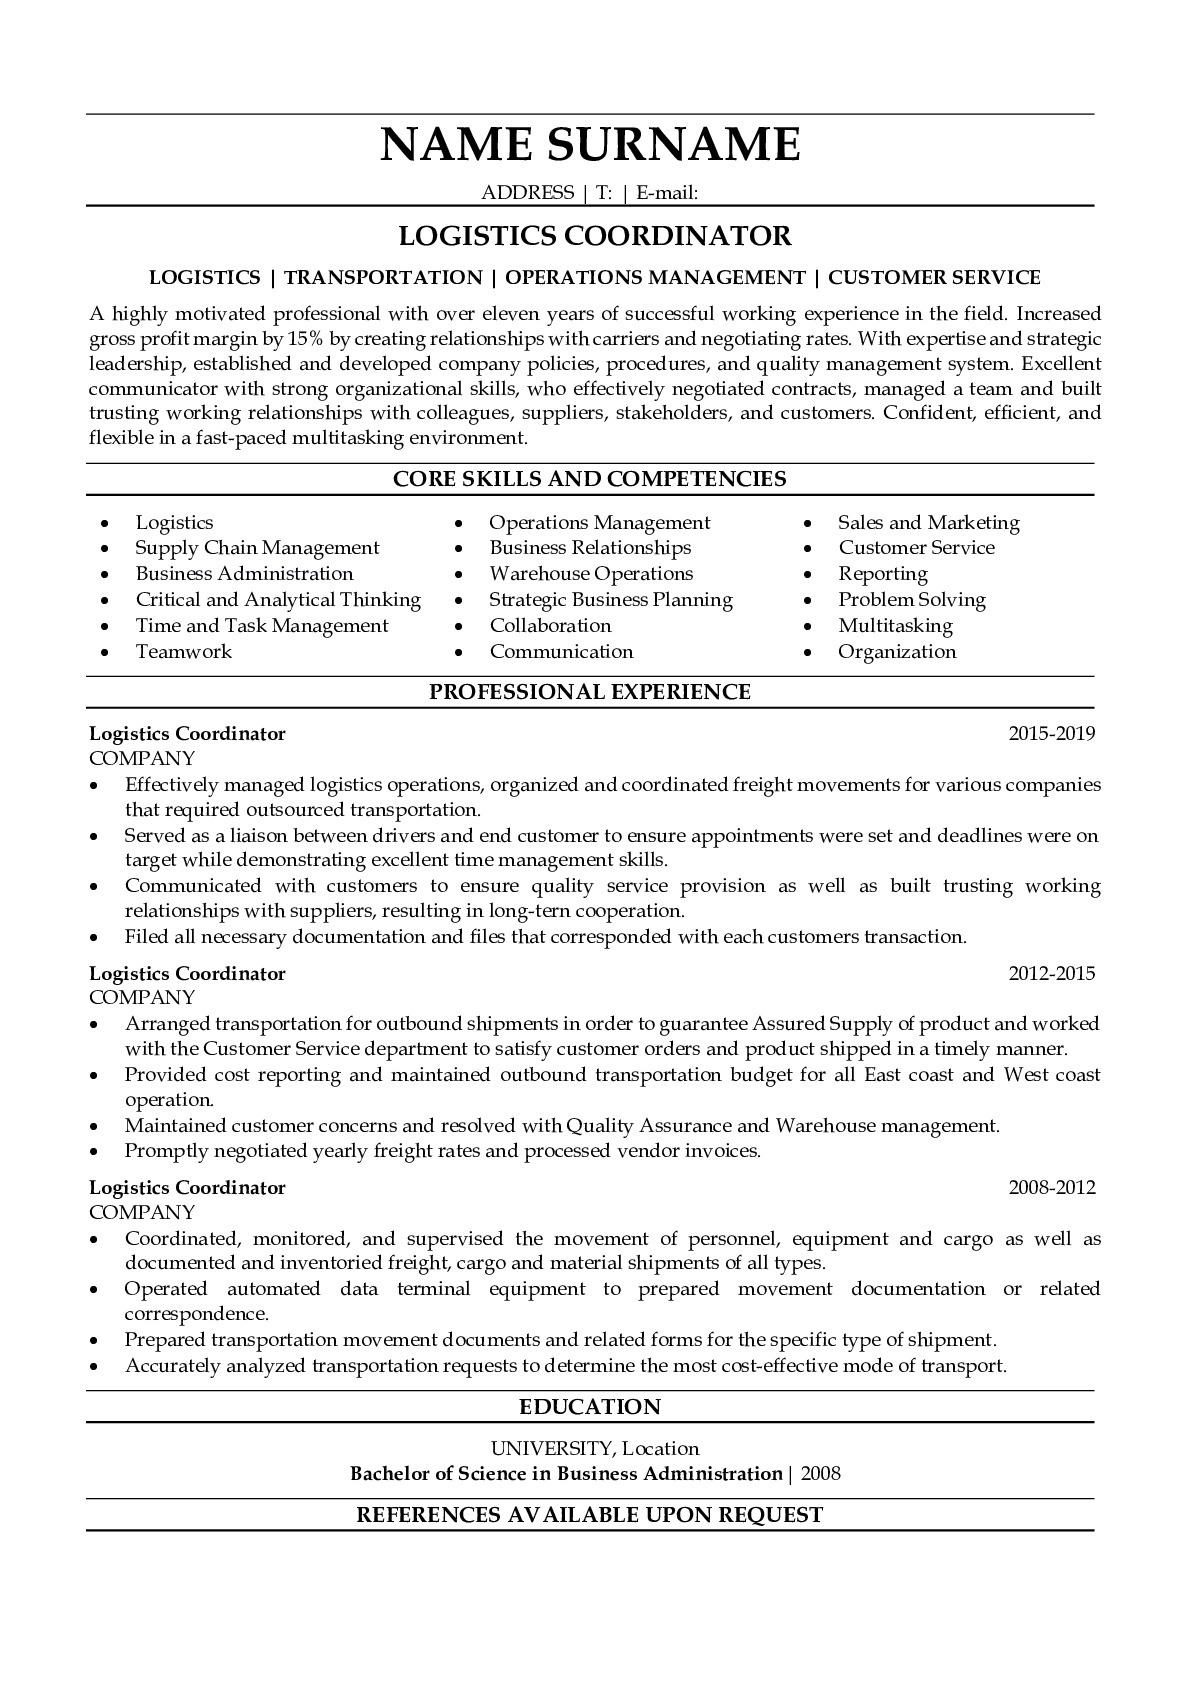 Resume Example for Logistics Coordinator